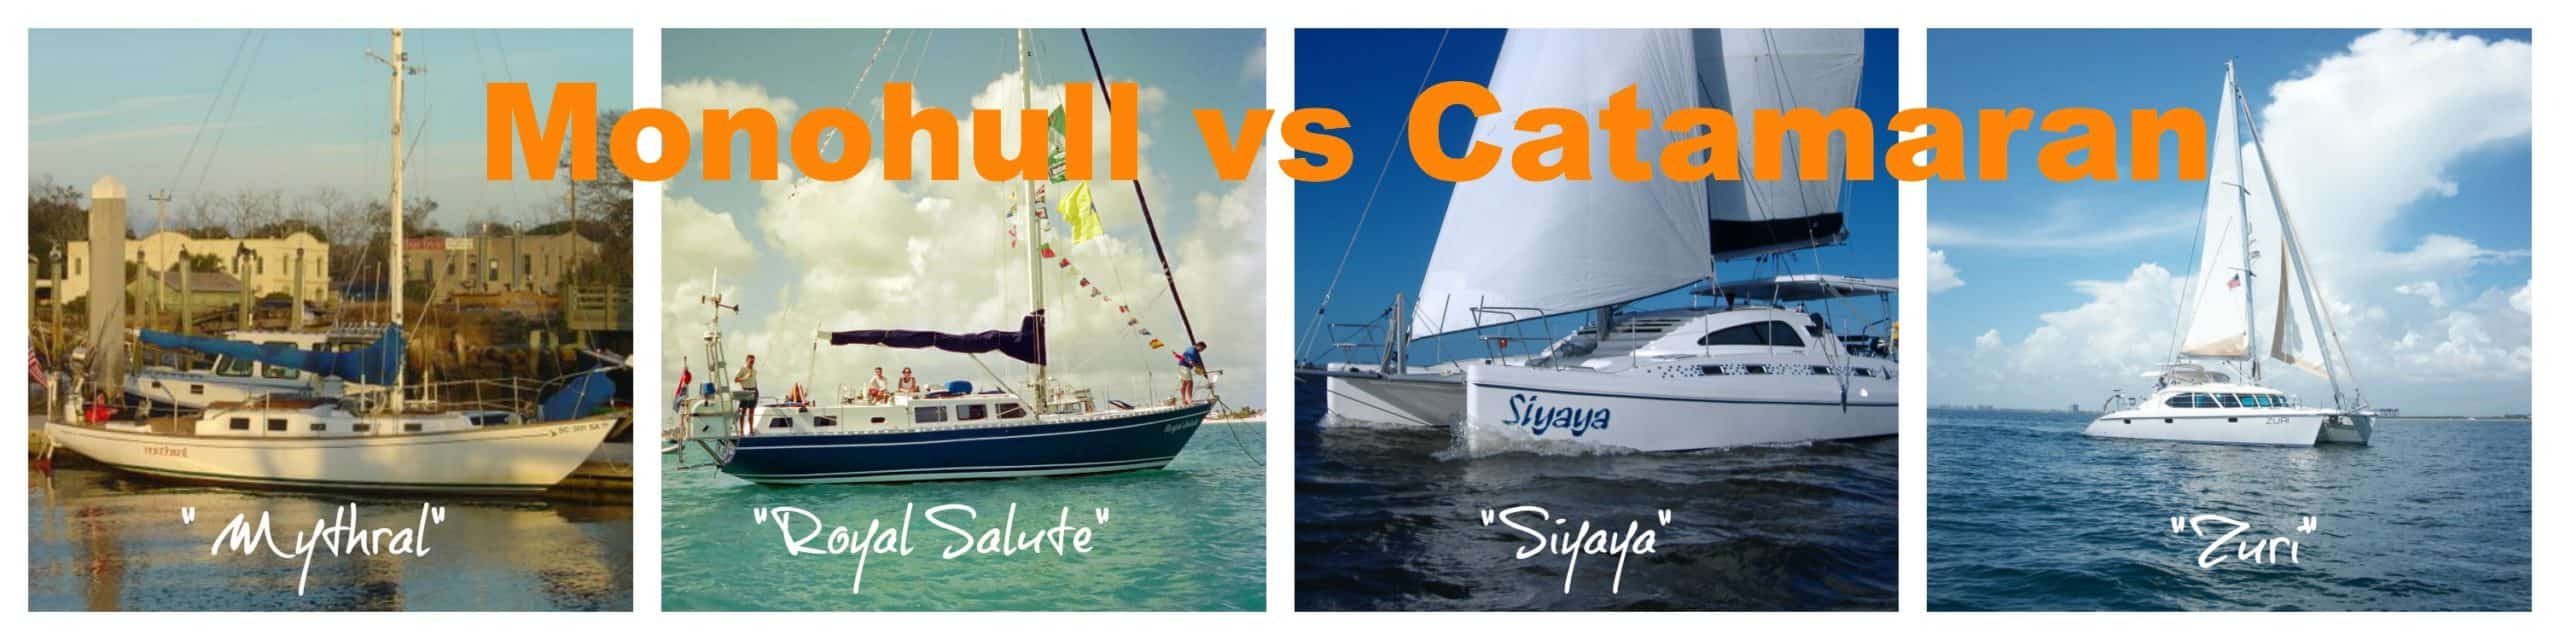 catamaran vs monohull